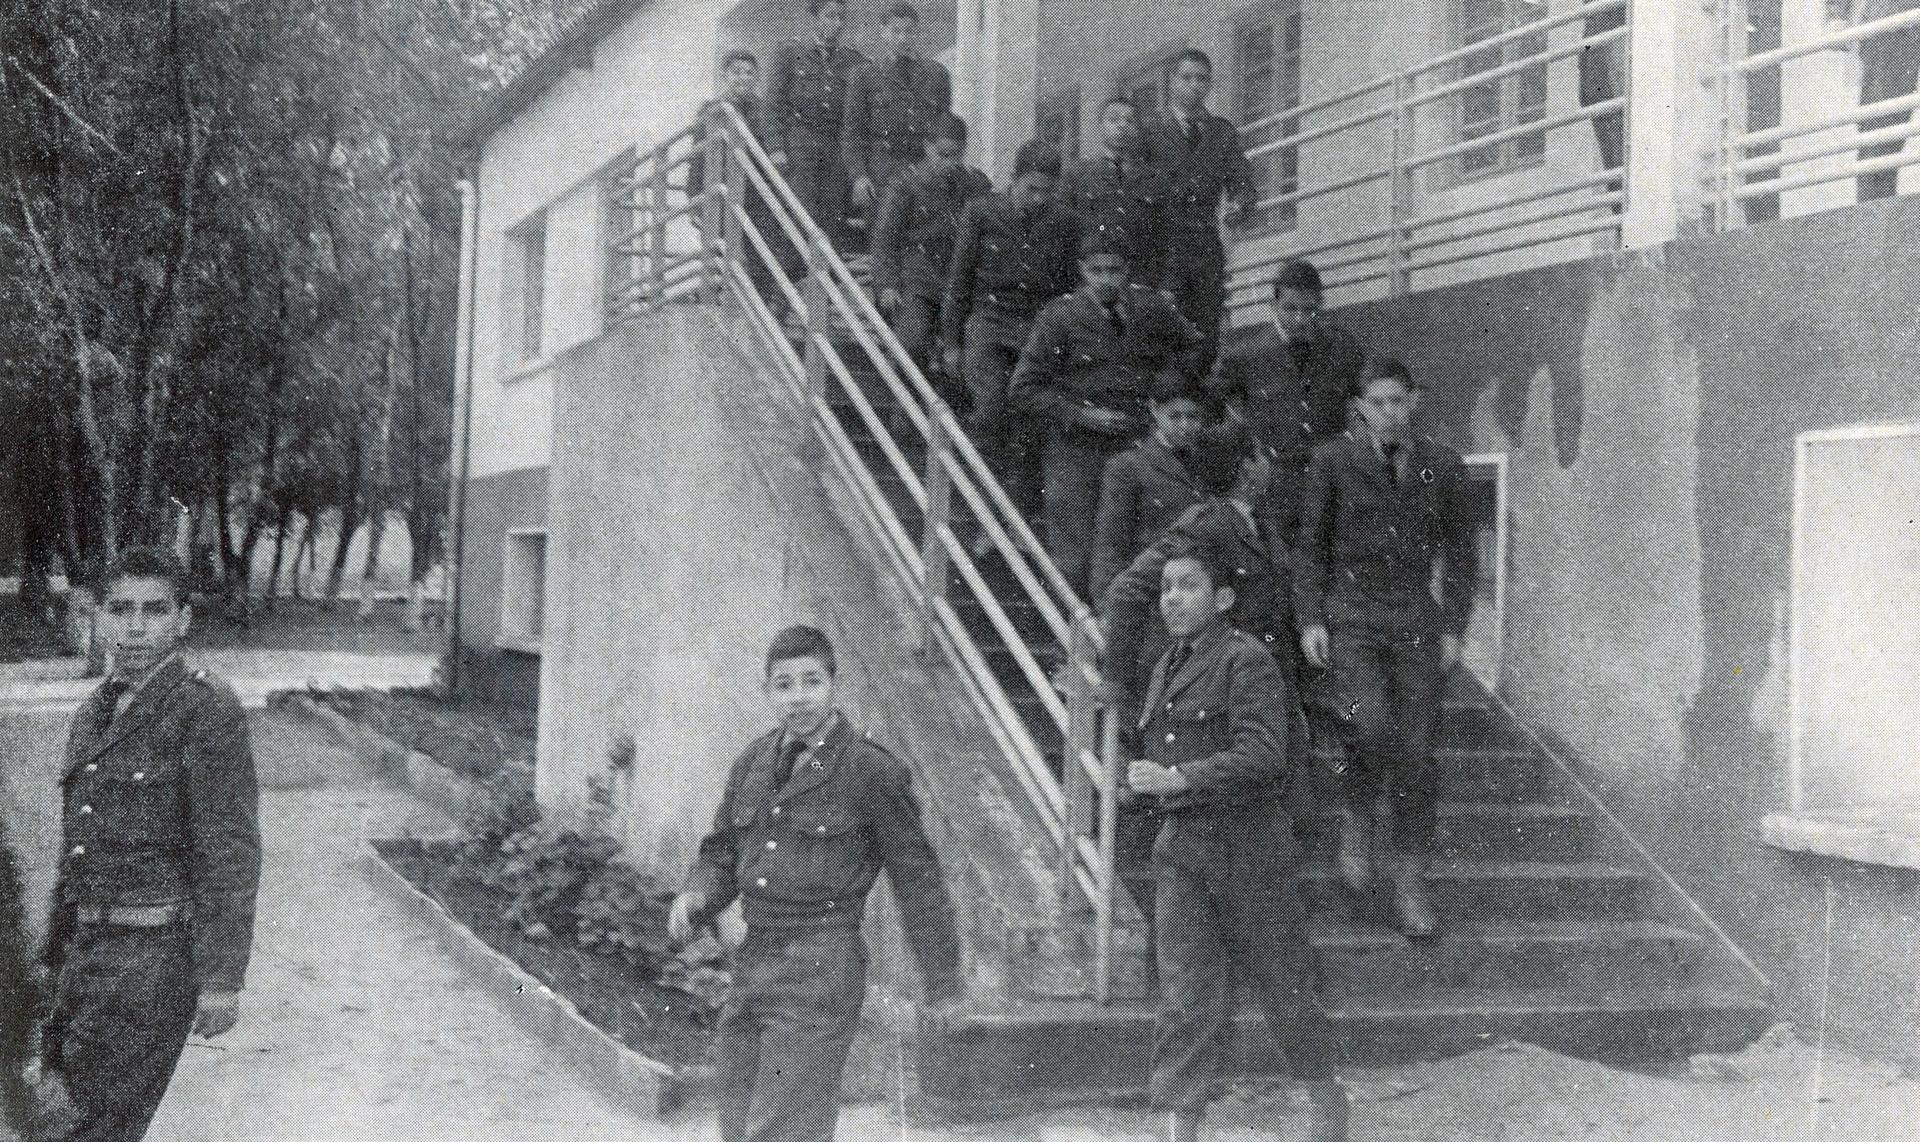 1er Lycée Militaire Royal Kénitra 31282383164_5ab169b83c_o